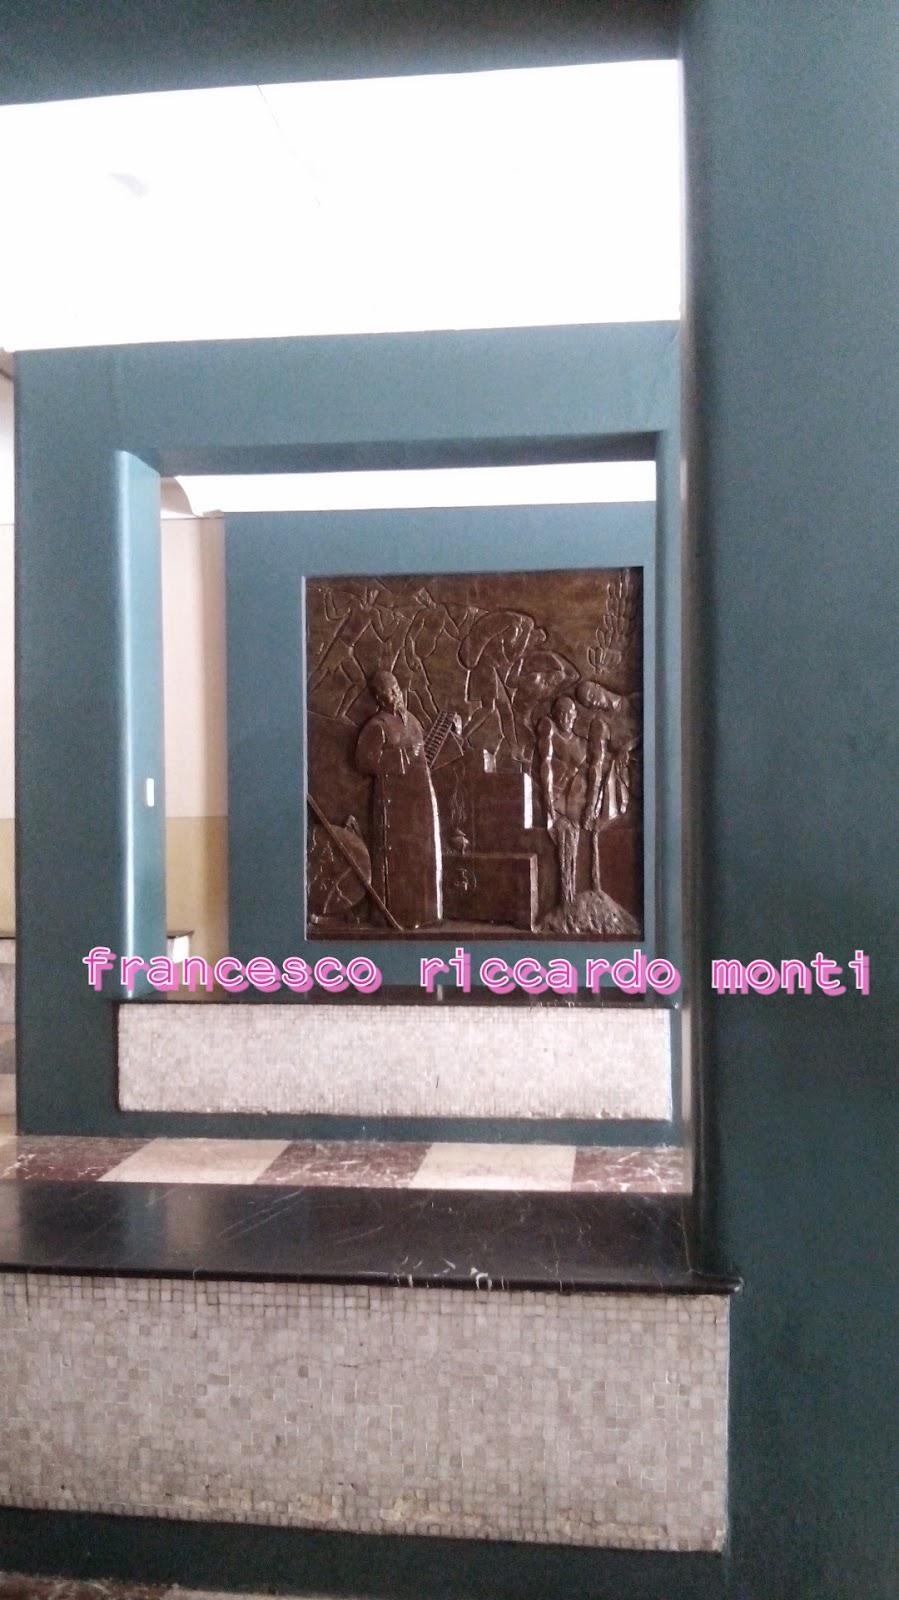 Wooden reliefs by Italian sculptor Francesco Riccardo Monti